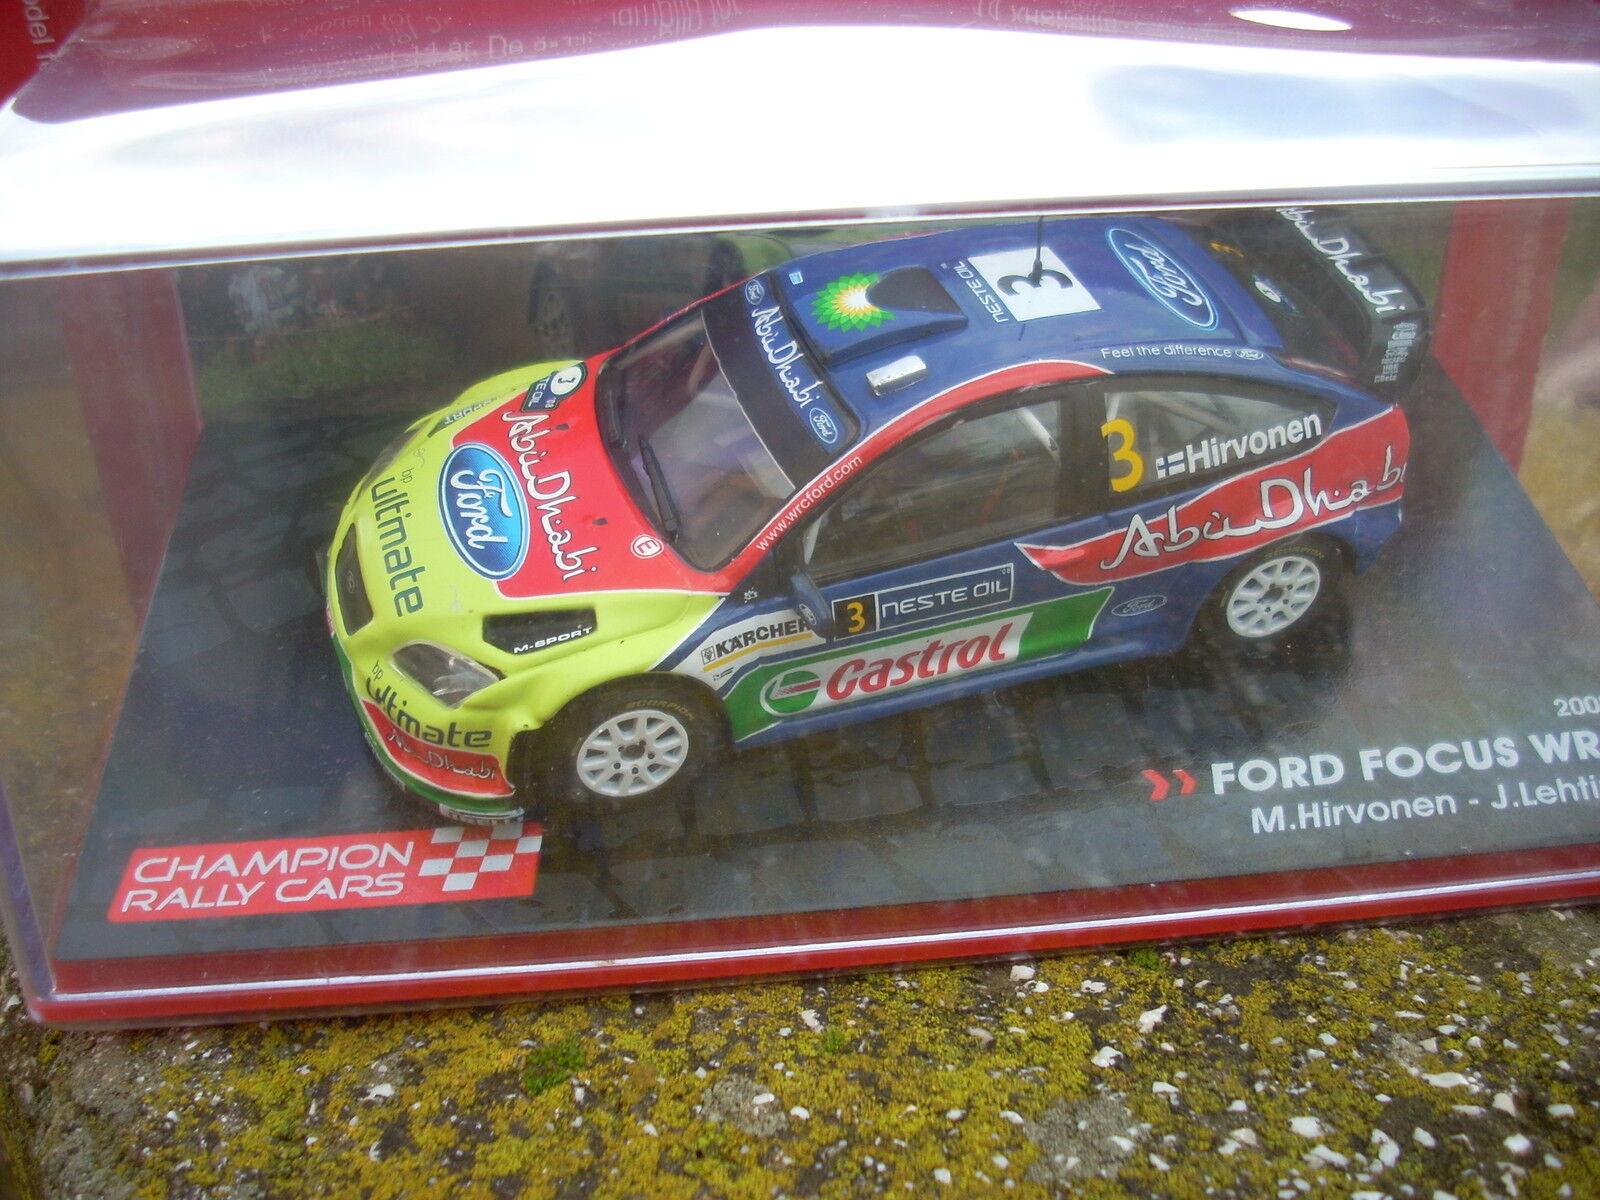 FORD FOCUS FOCUS FOCUS WRC 2008 M.HIRVONEN-J.LEHTIEN scala 1\43 8d4a75